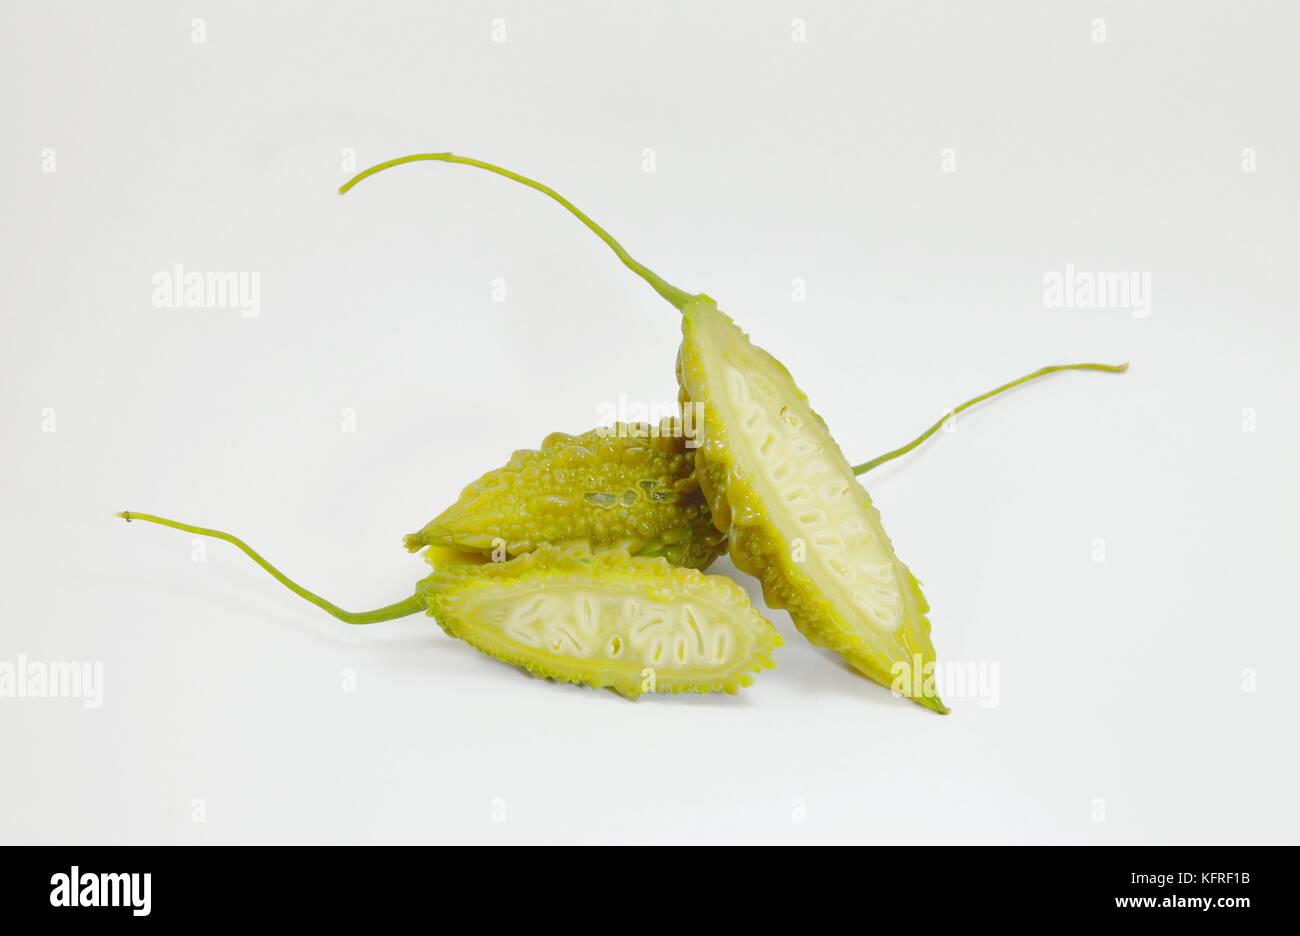 bitter cucumber slice on white background - Stock Image